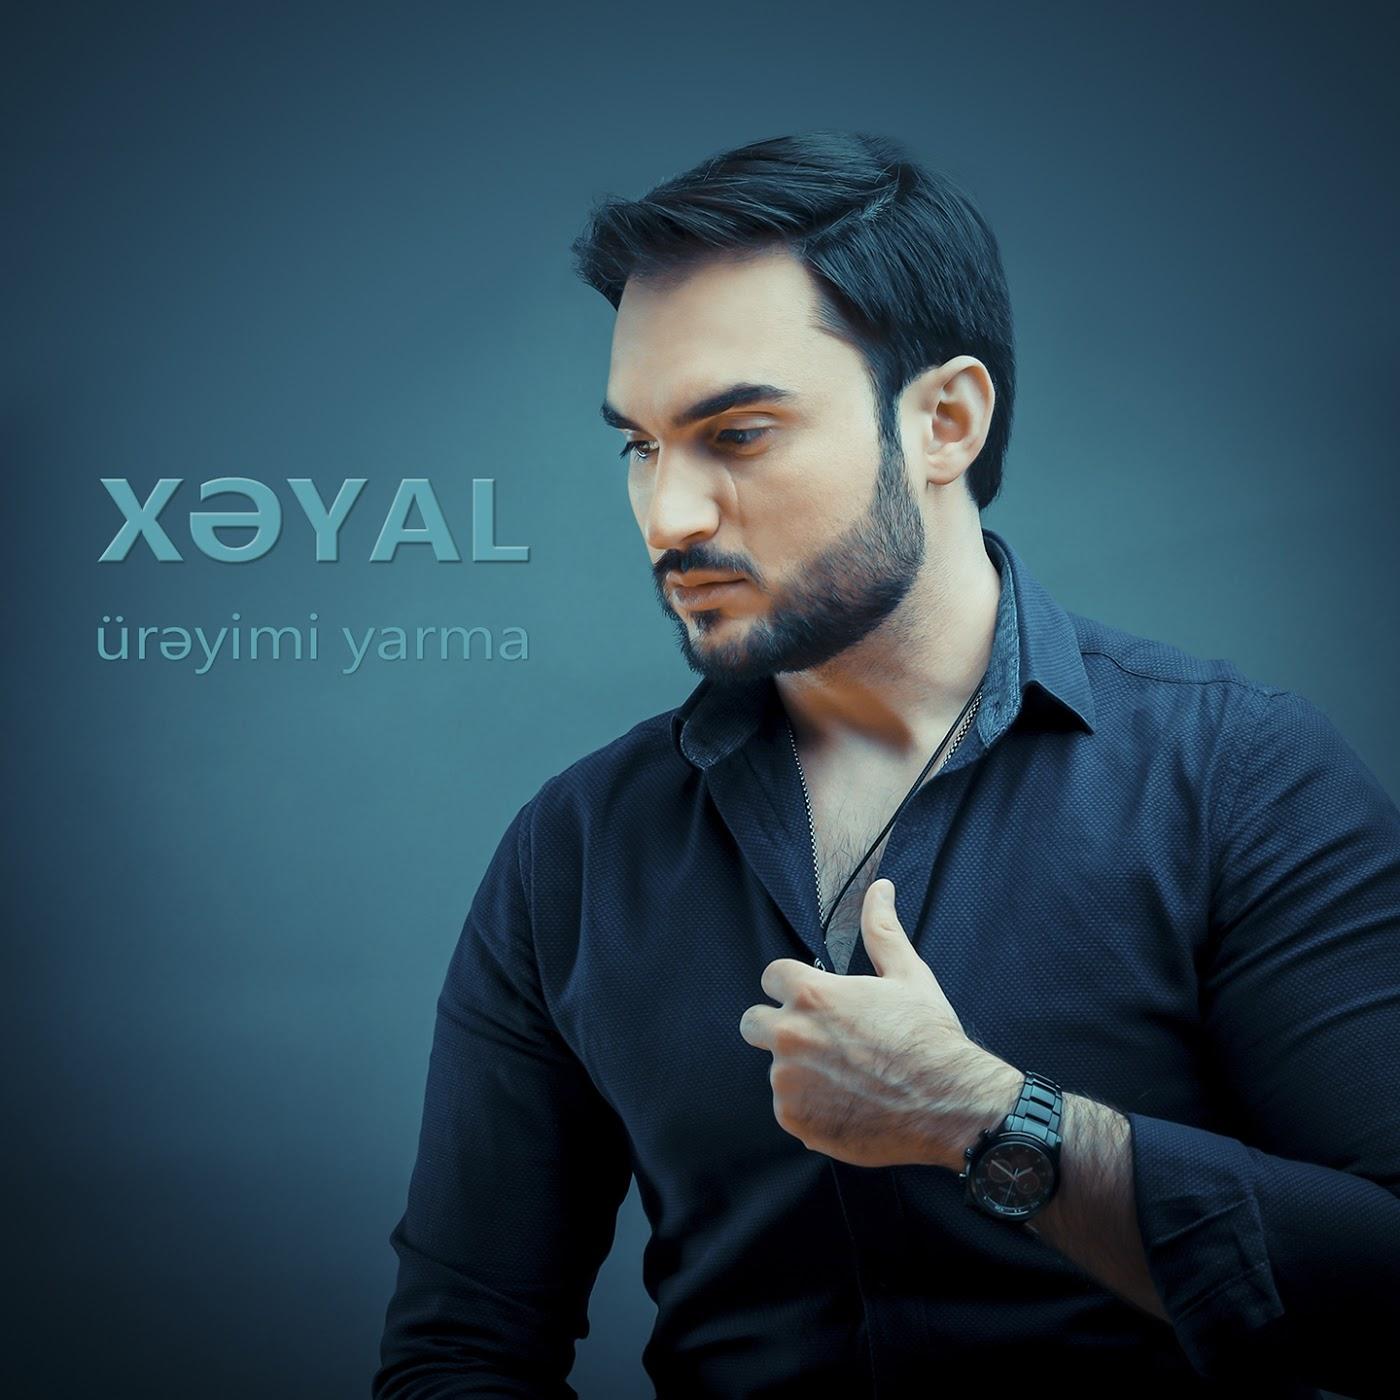 http://s8.picofile.com/file/8367264534/36Xeyal_Ureyimi_Yarma.jpg